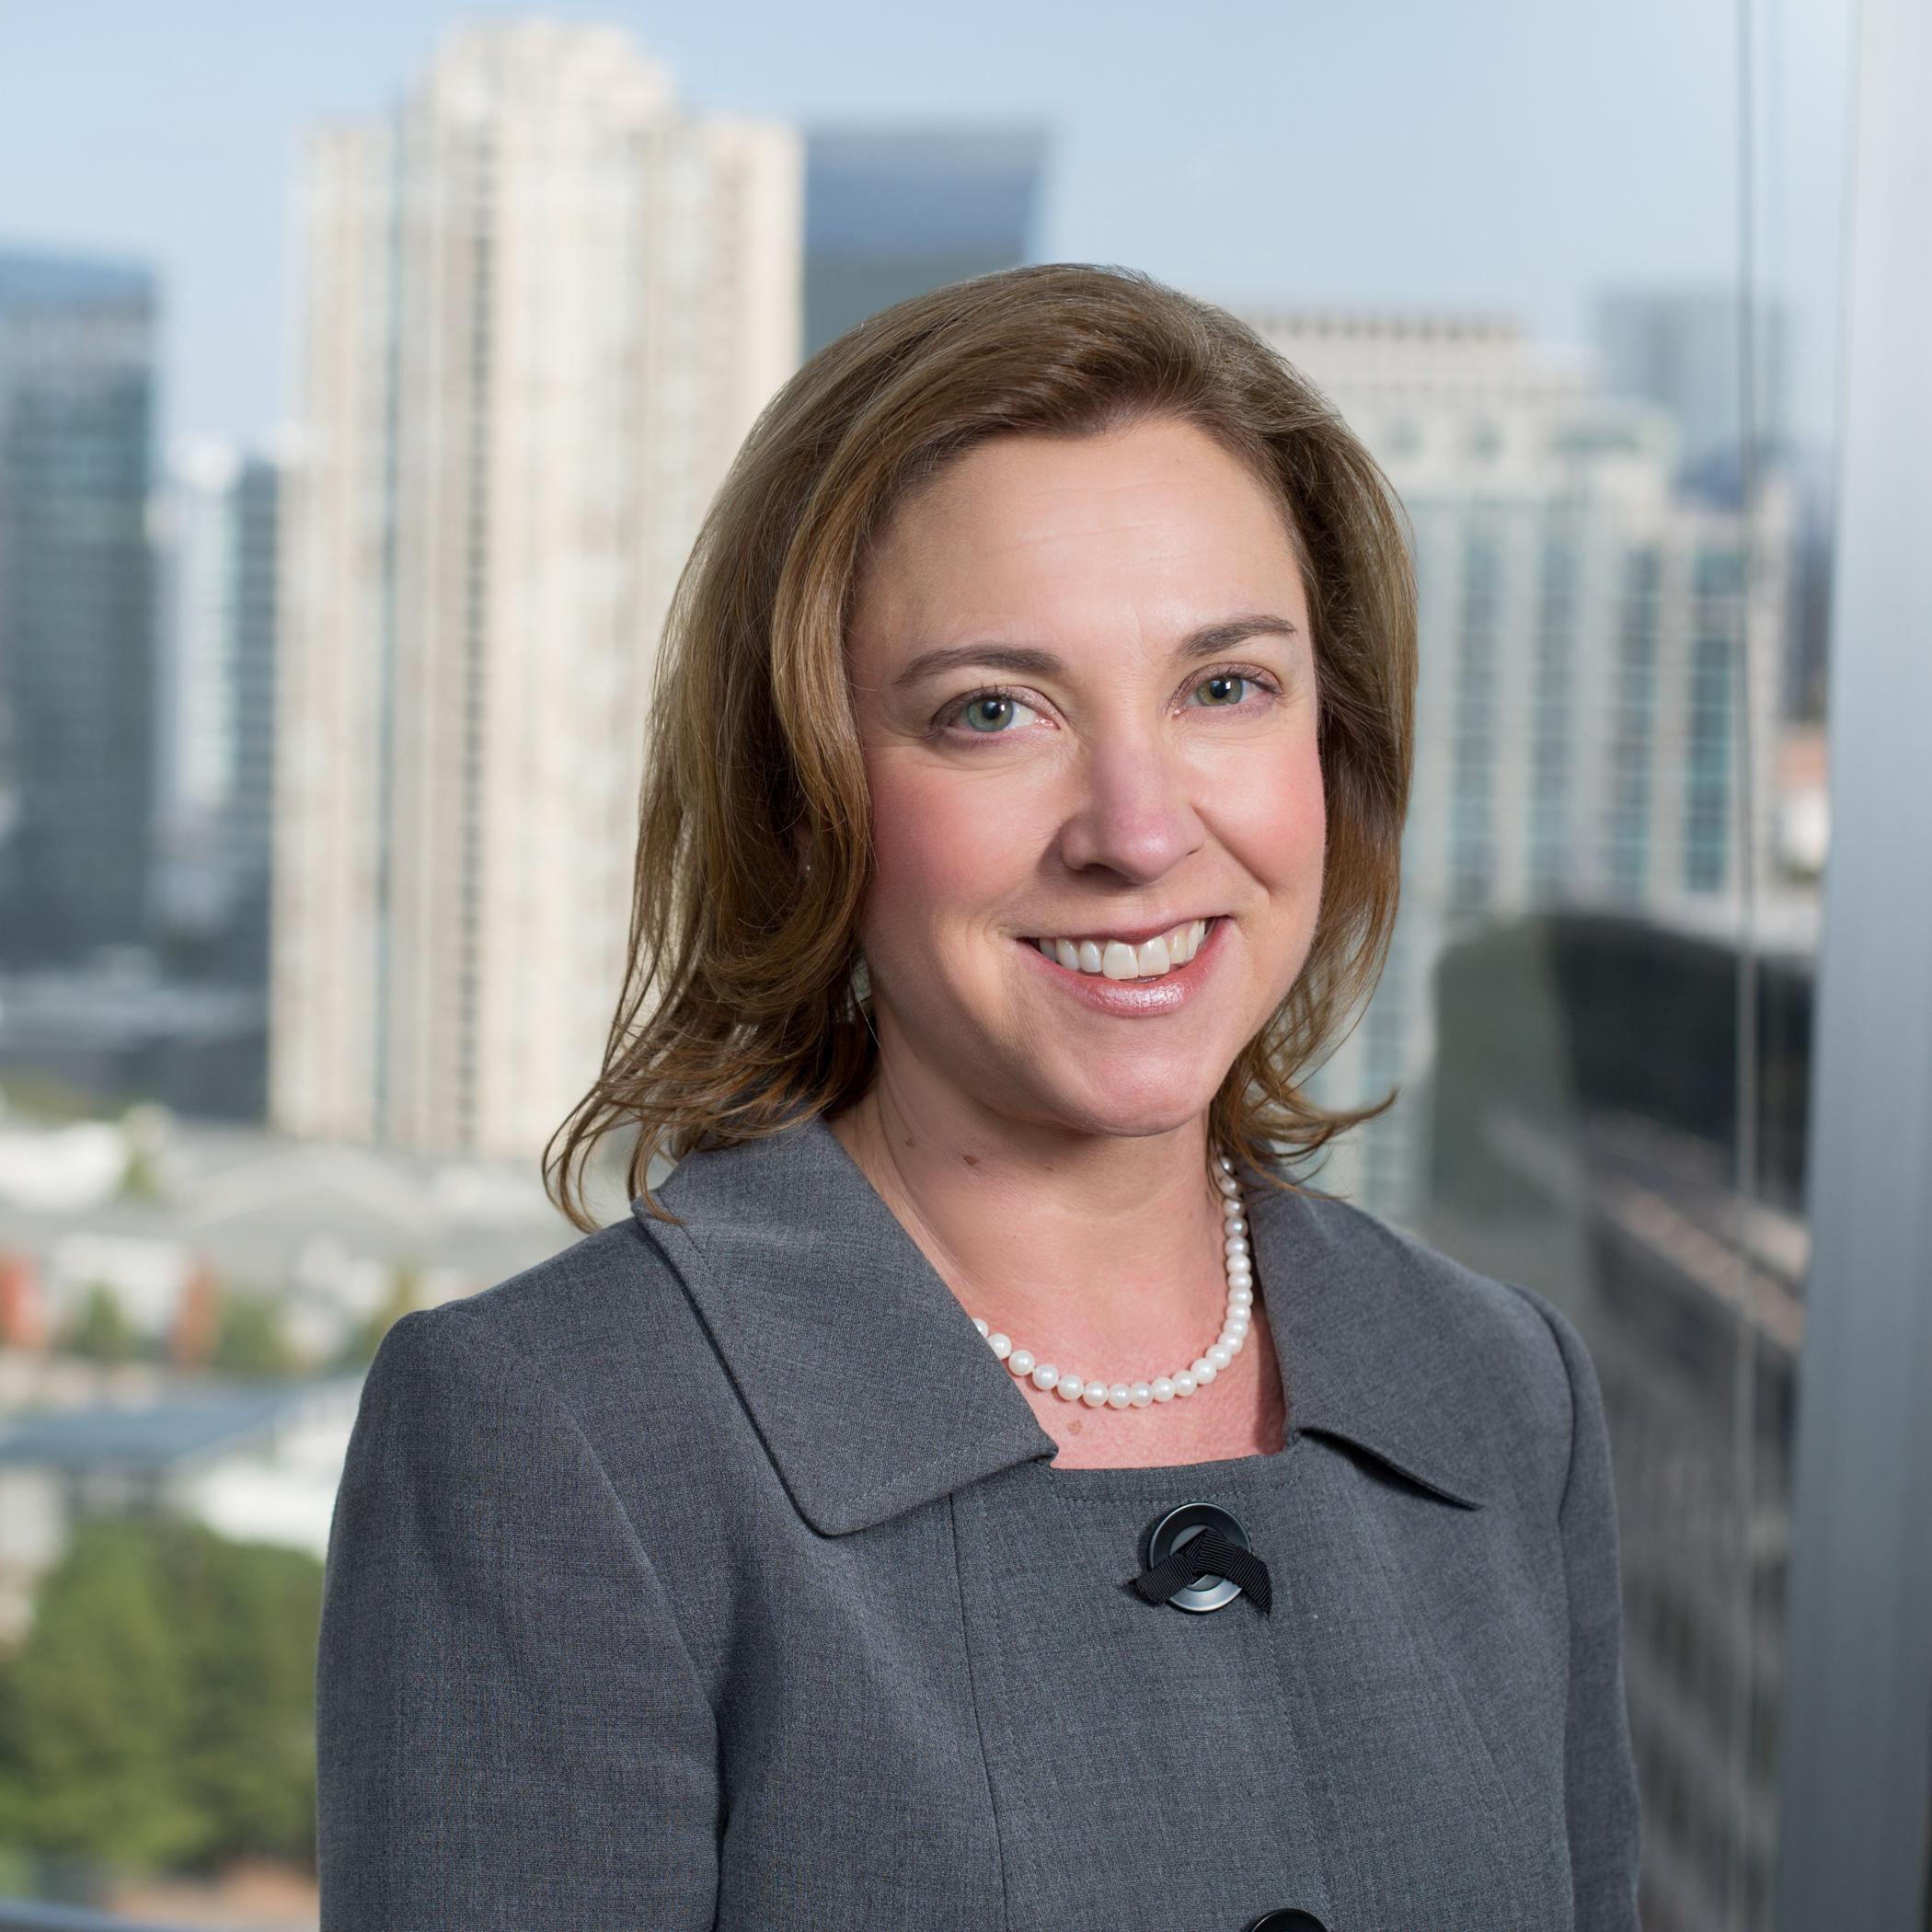 Rebecca W. Shanlever